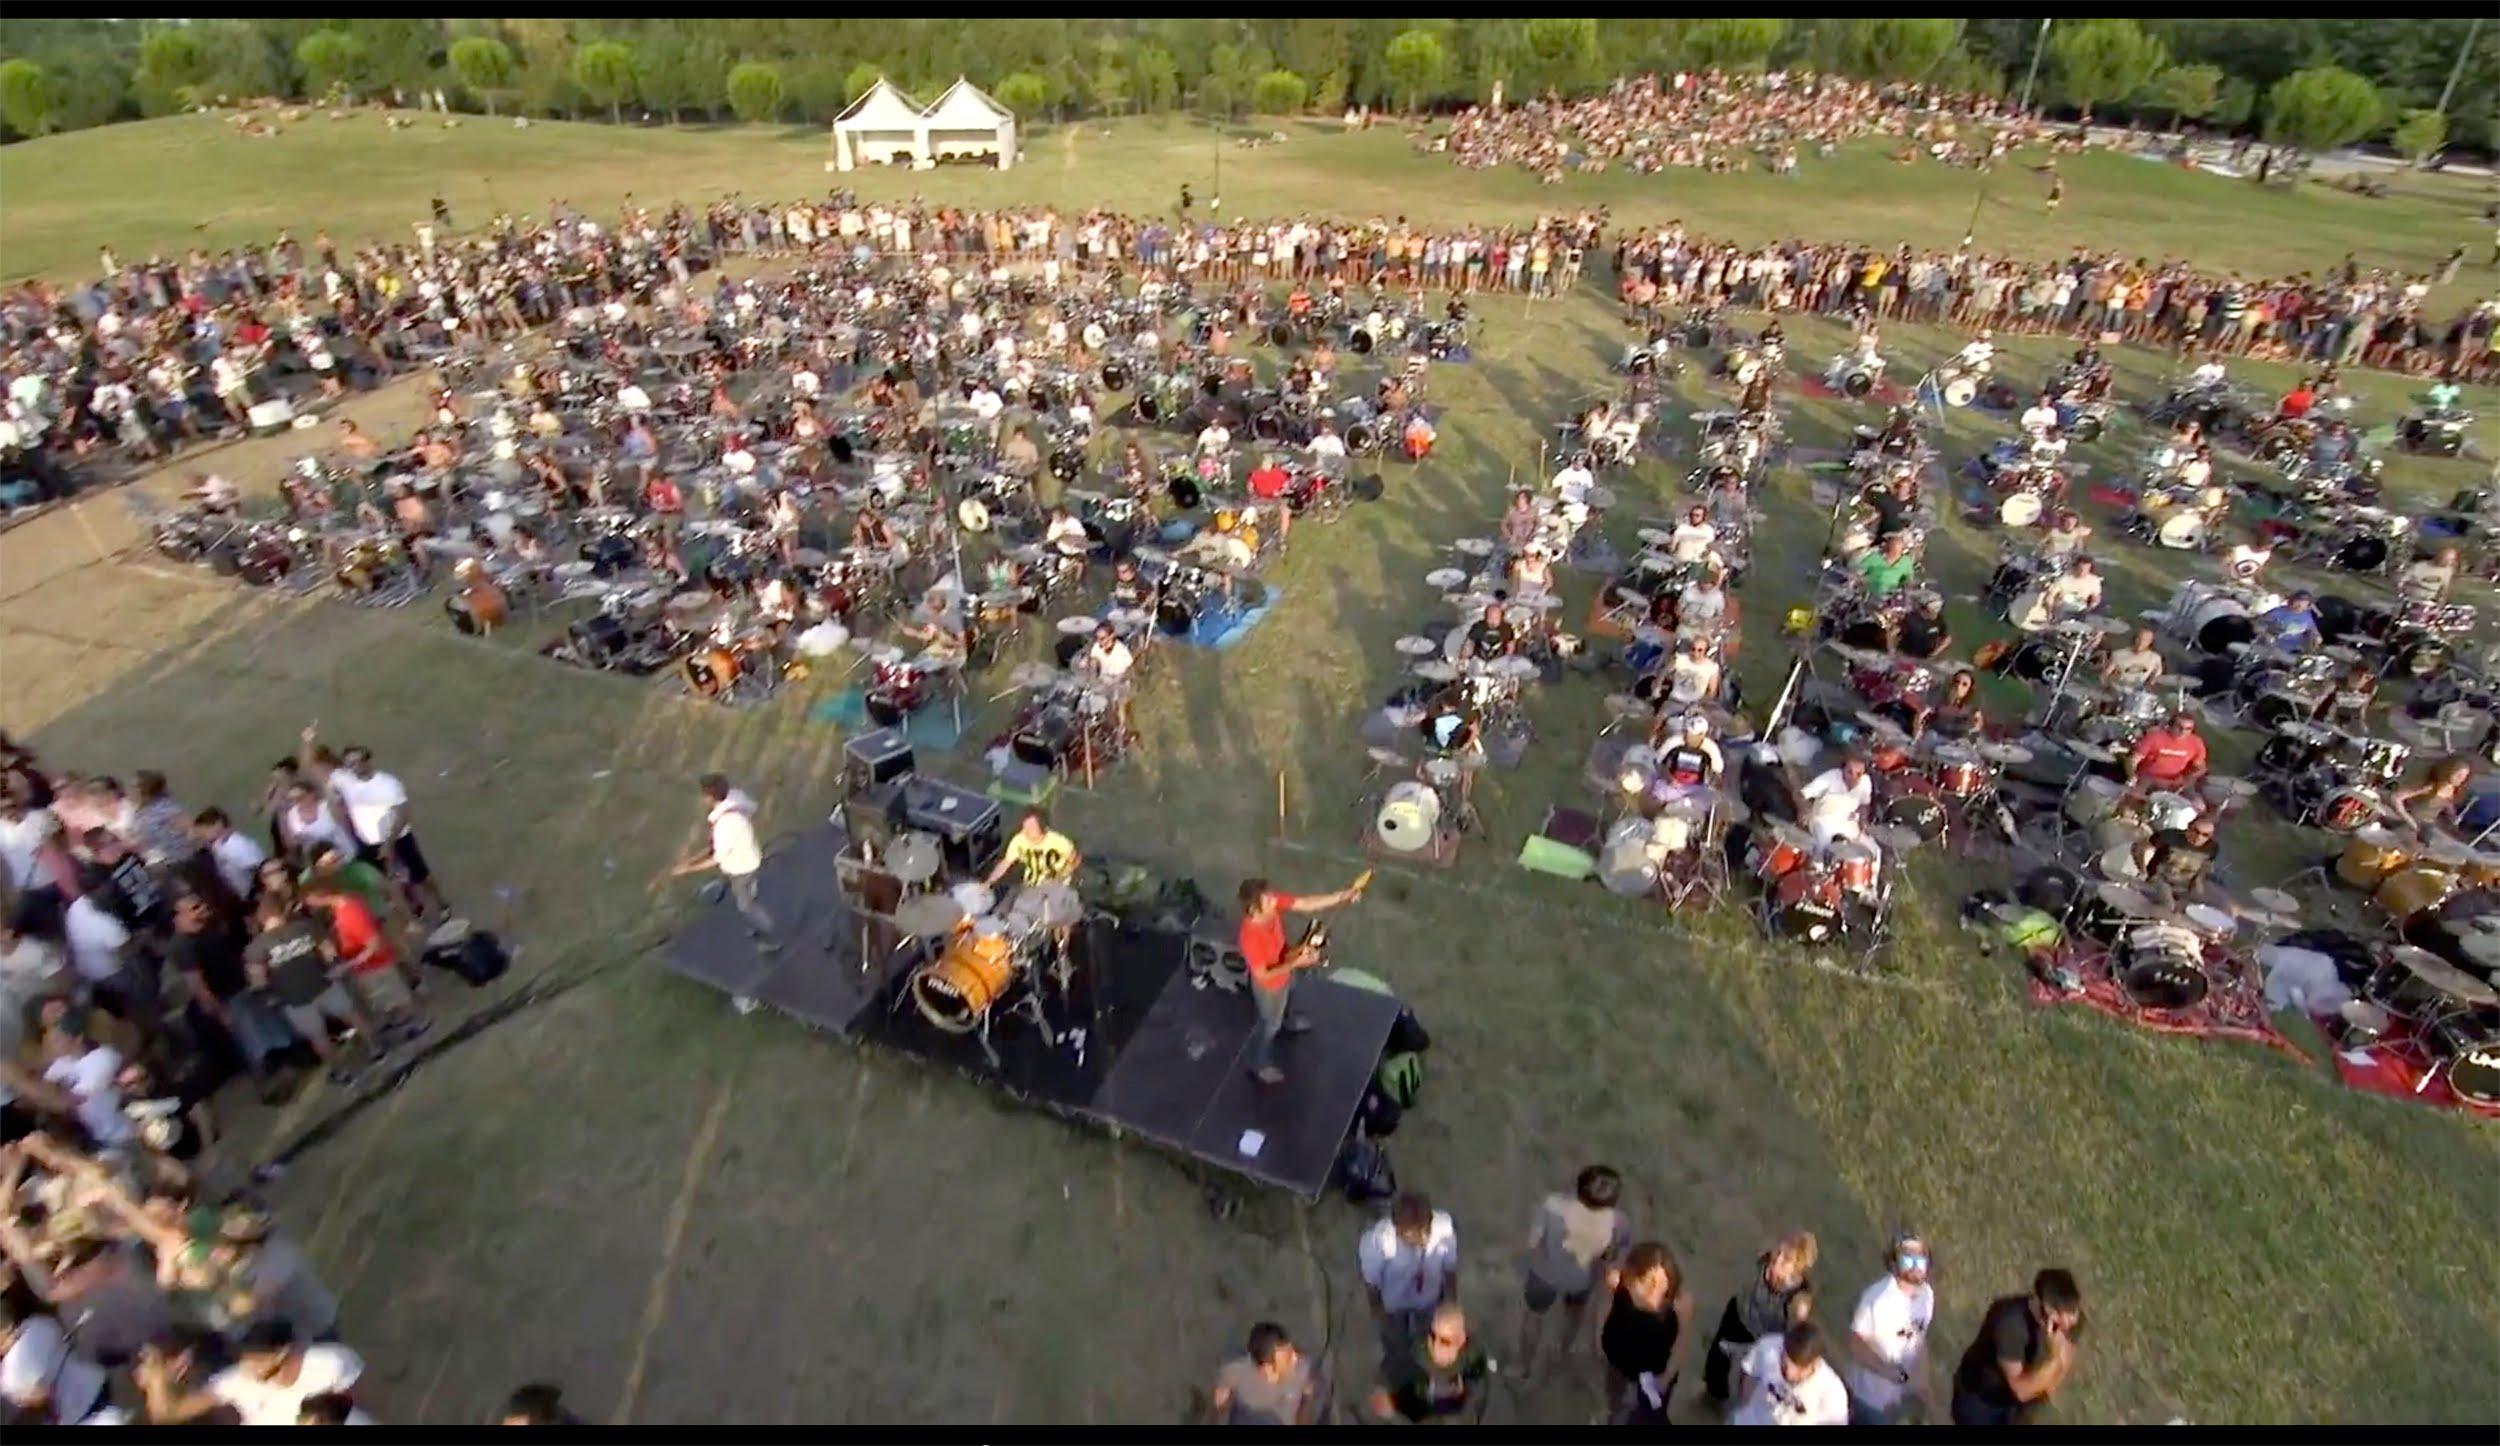 "Gute Musik am Abend: 1000 Musiker performen ""Learn to fly"" von den Foo Fighters"